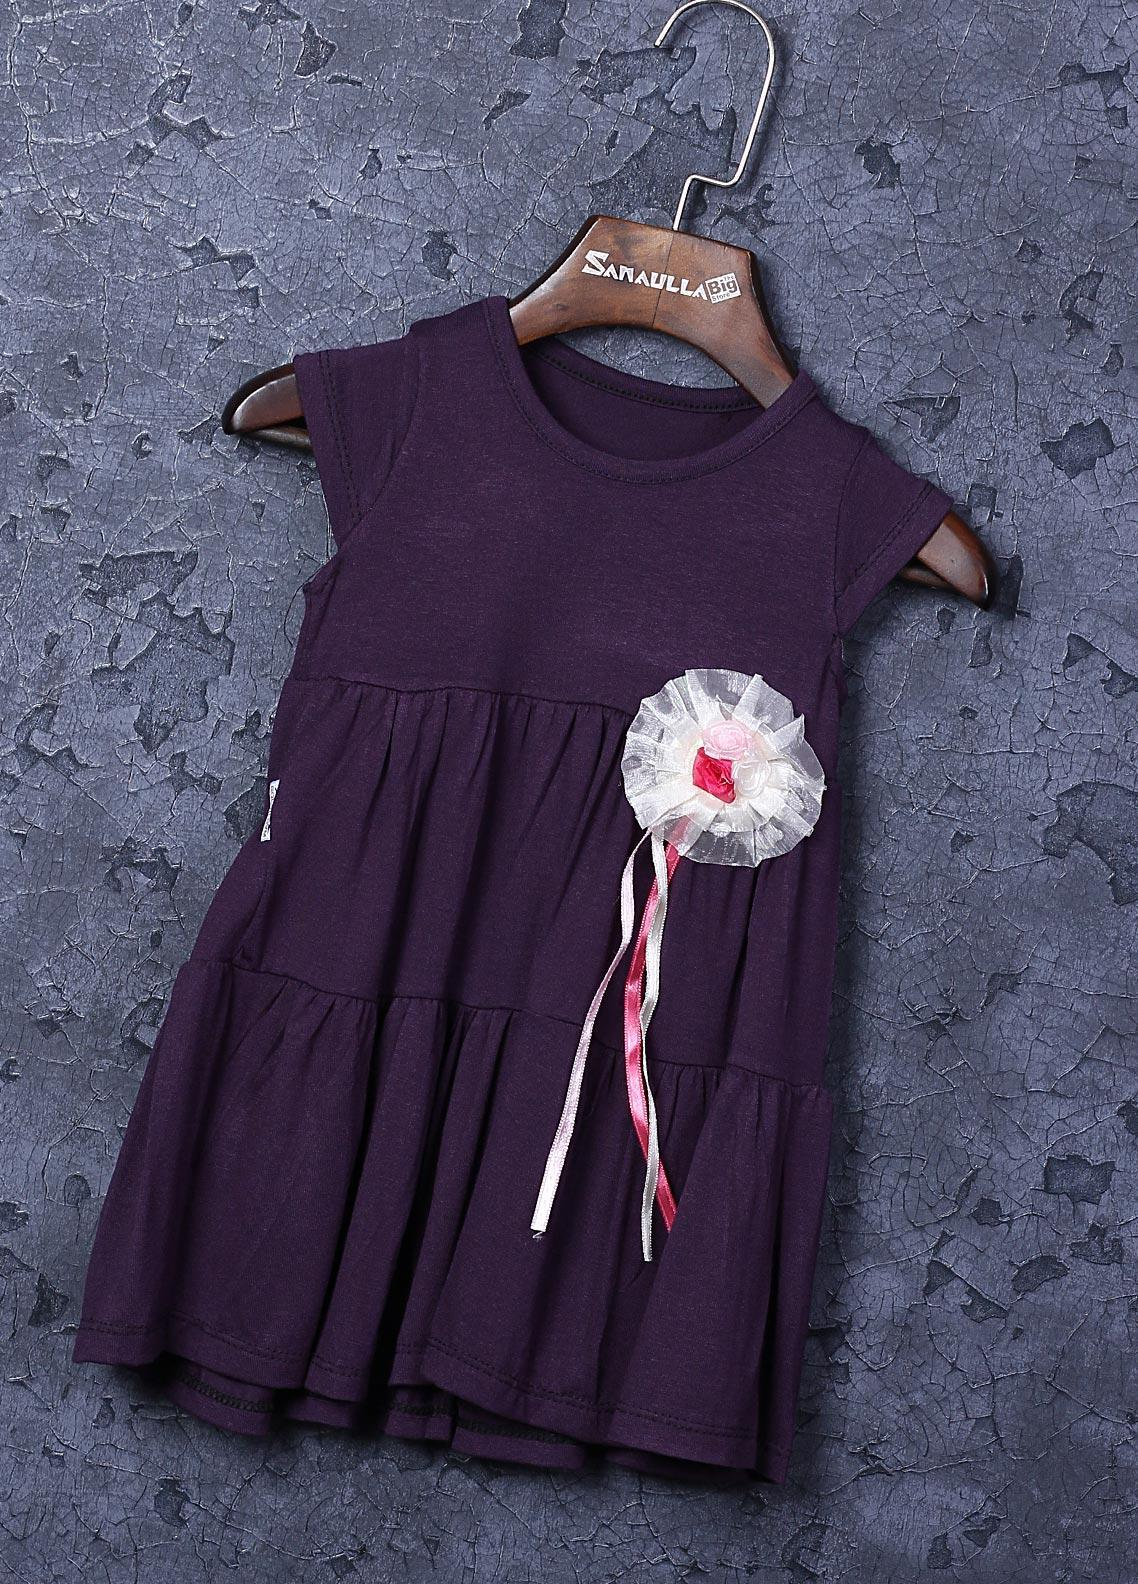 Sanaulla Exclusive Range Cotton Fancy Girls Frocks -  22707-1 Purple